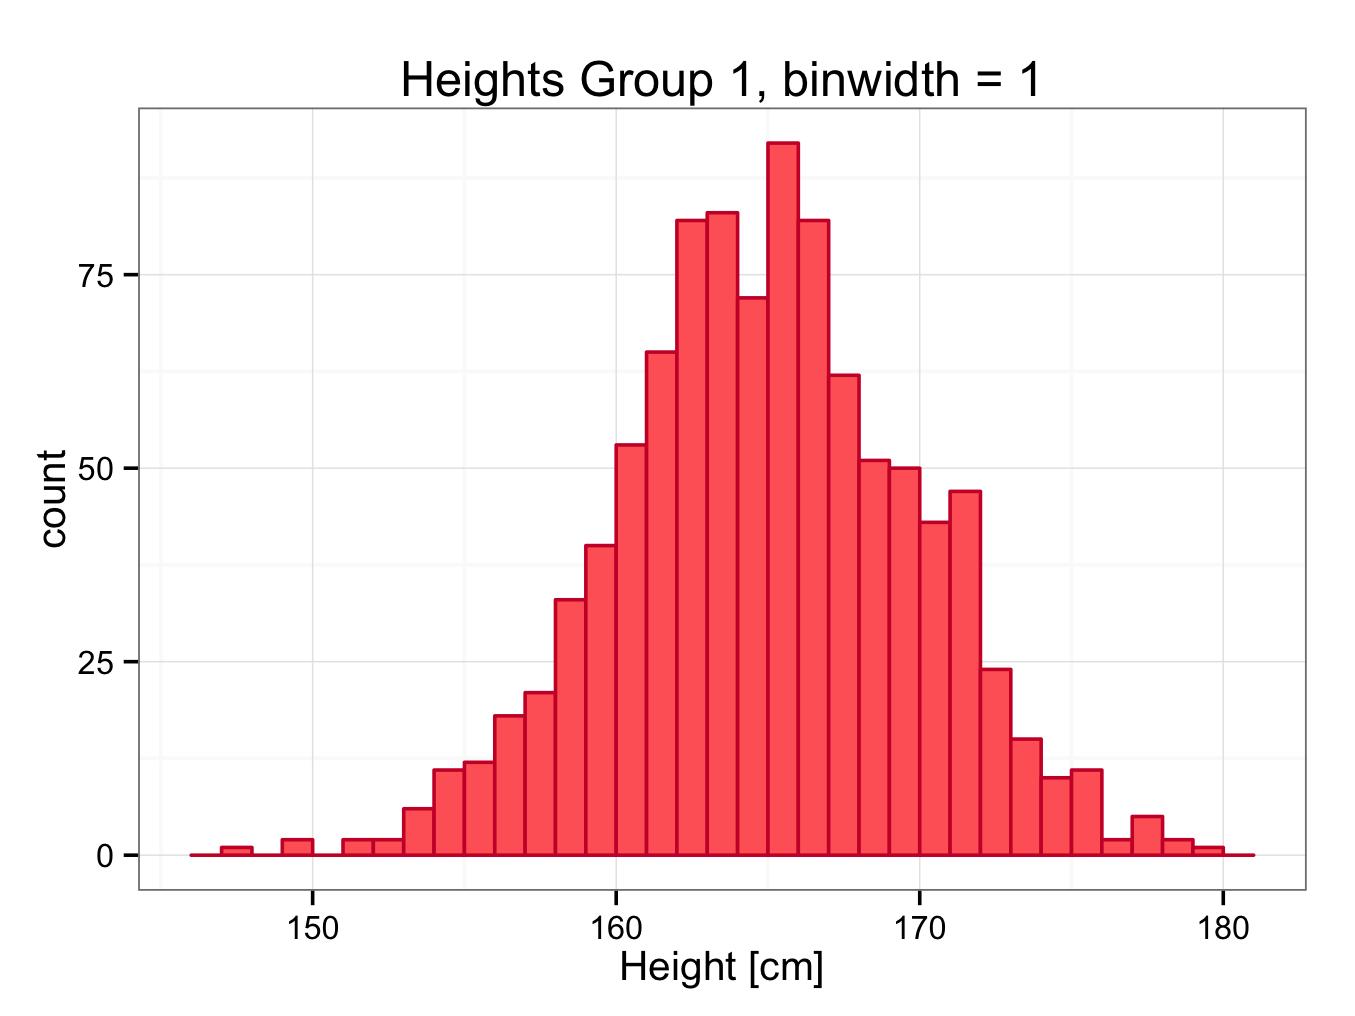 heightgroup1bin1